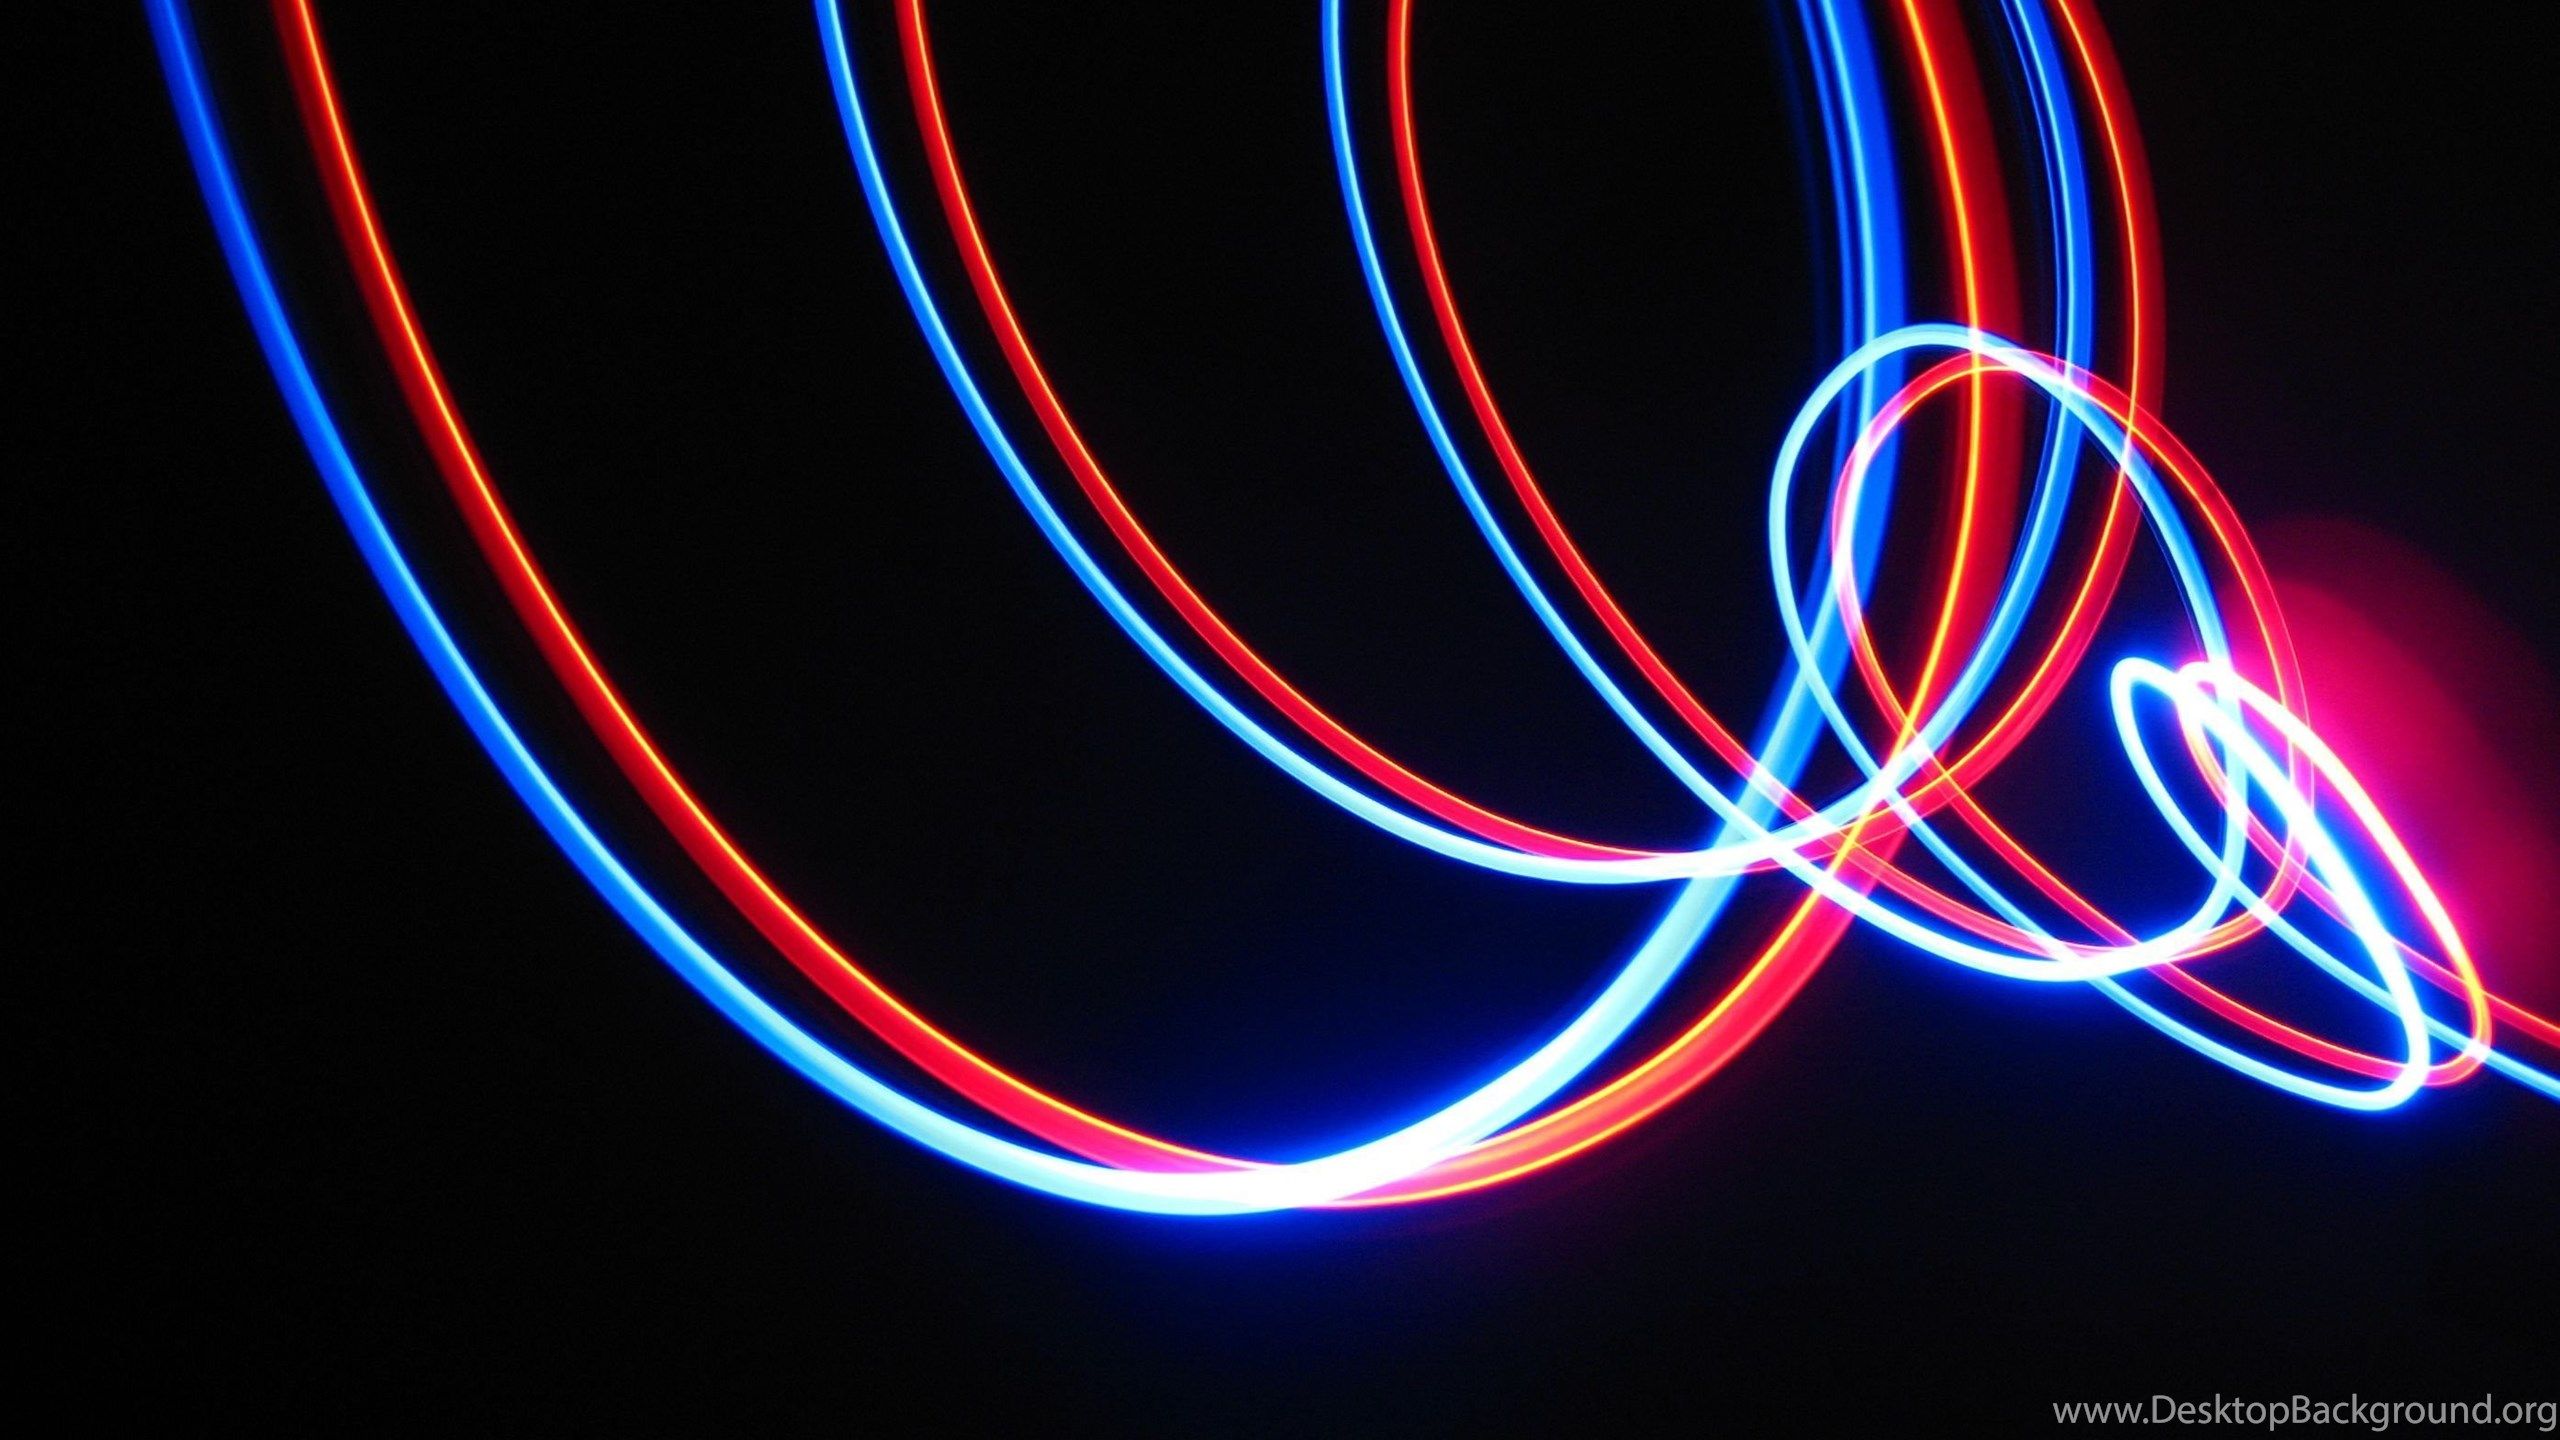 Top Neon Light Wallpaper Images For Pinterest Desktop ...